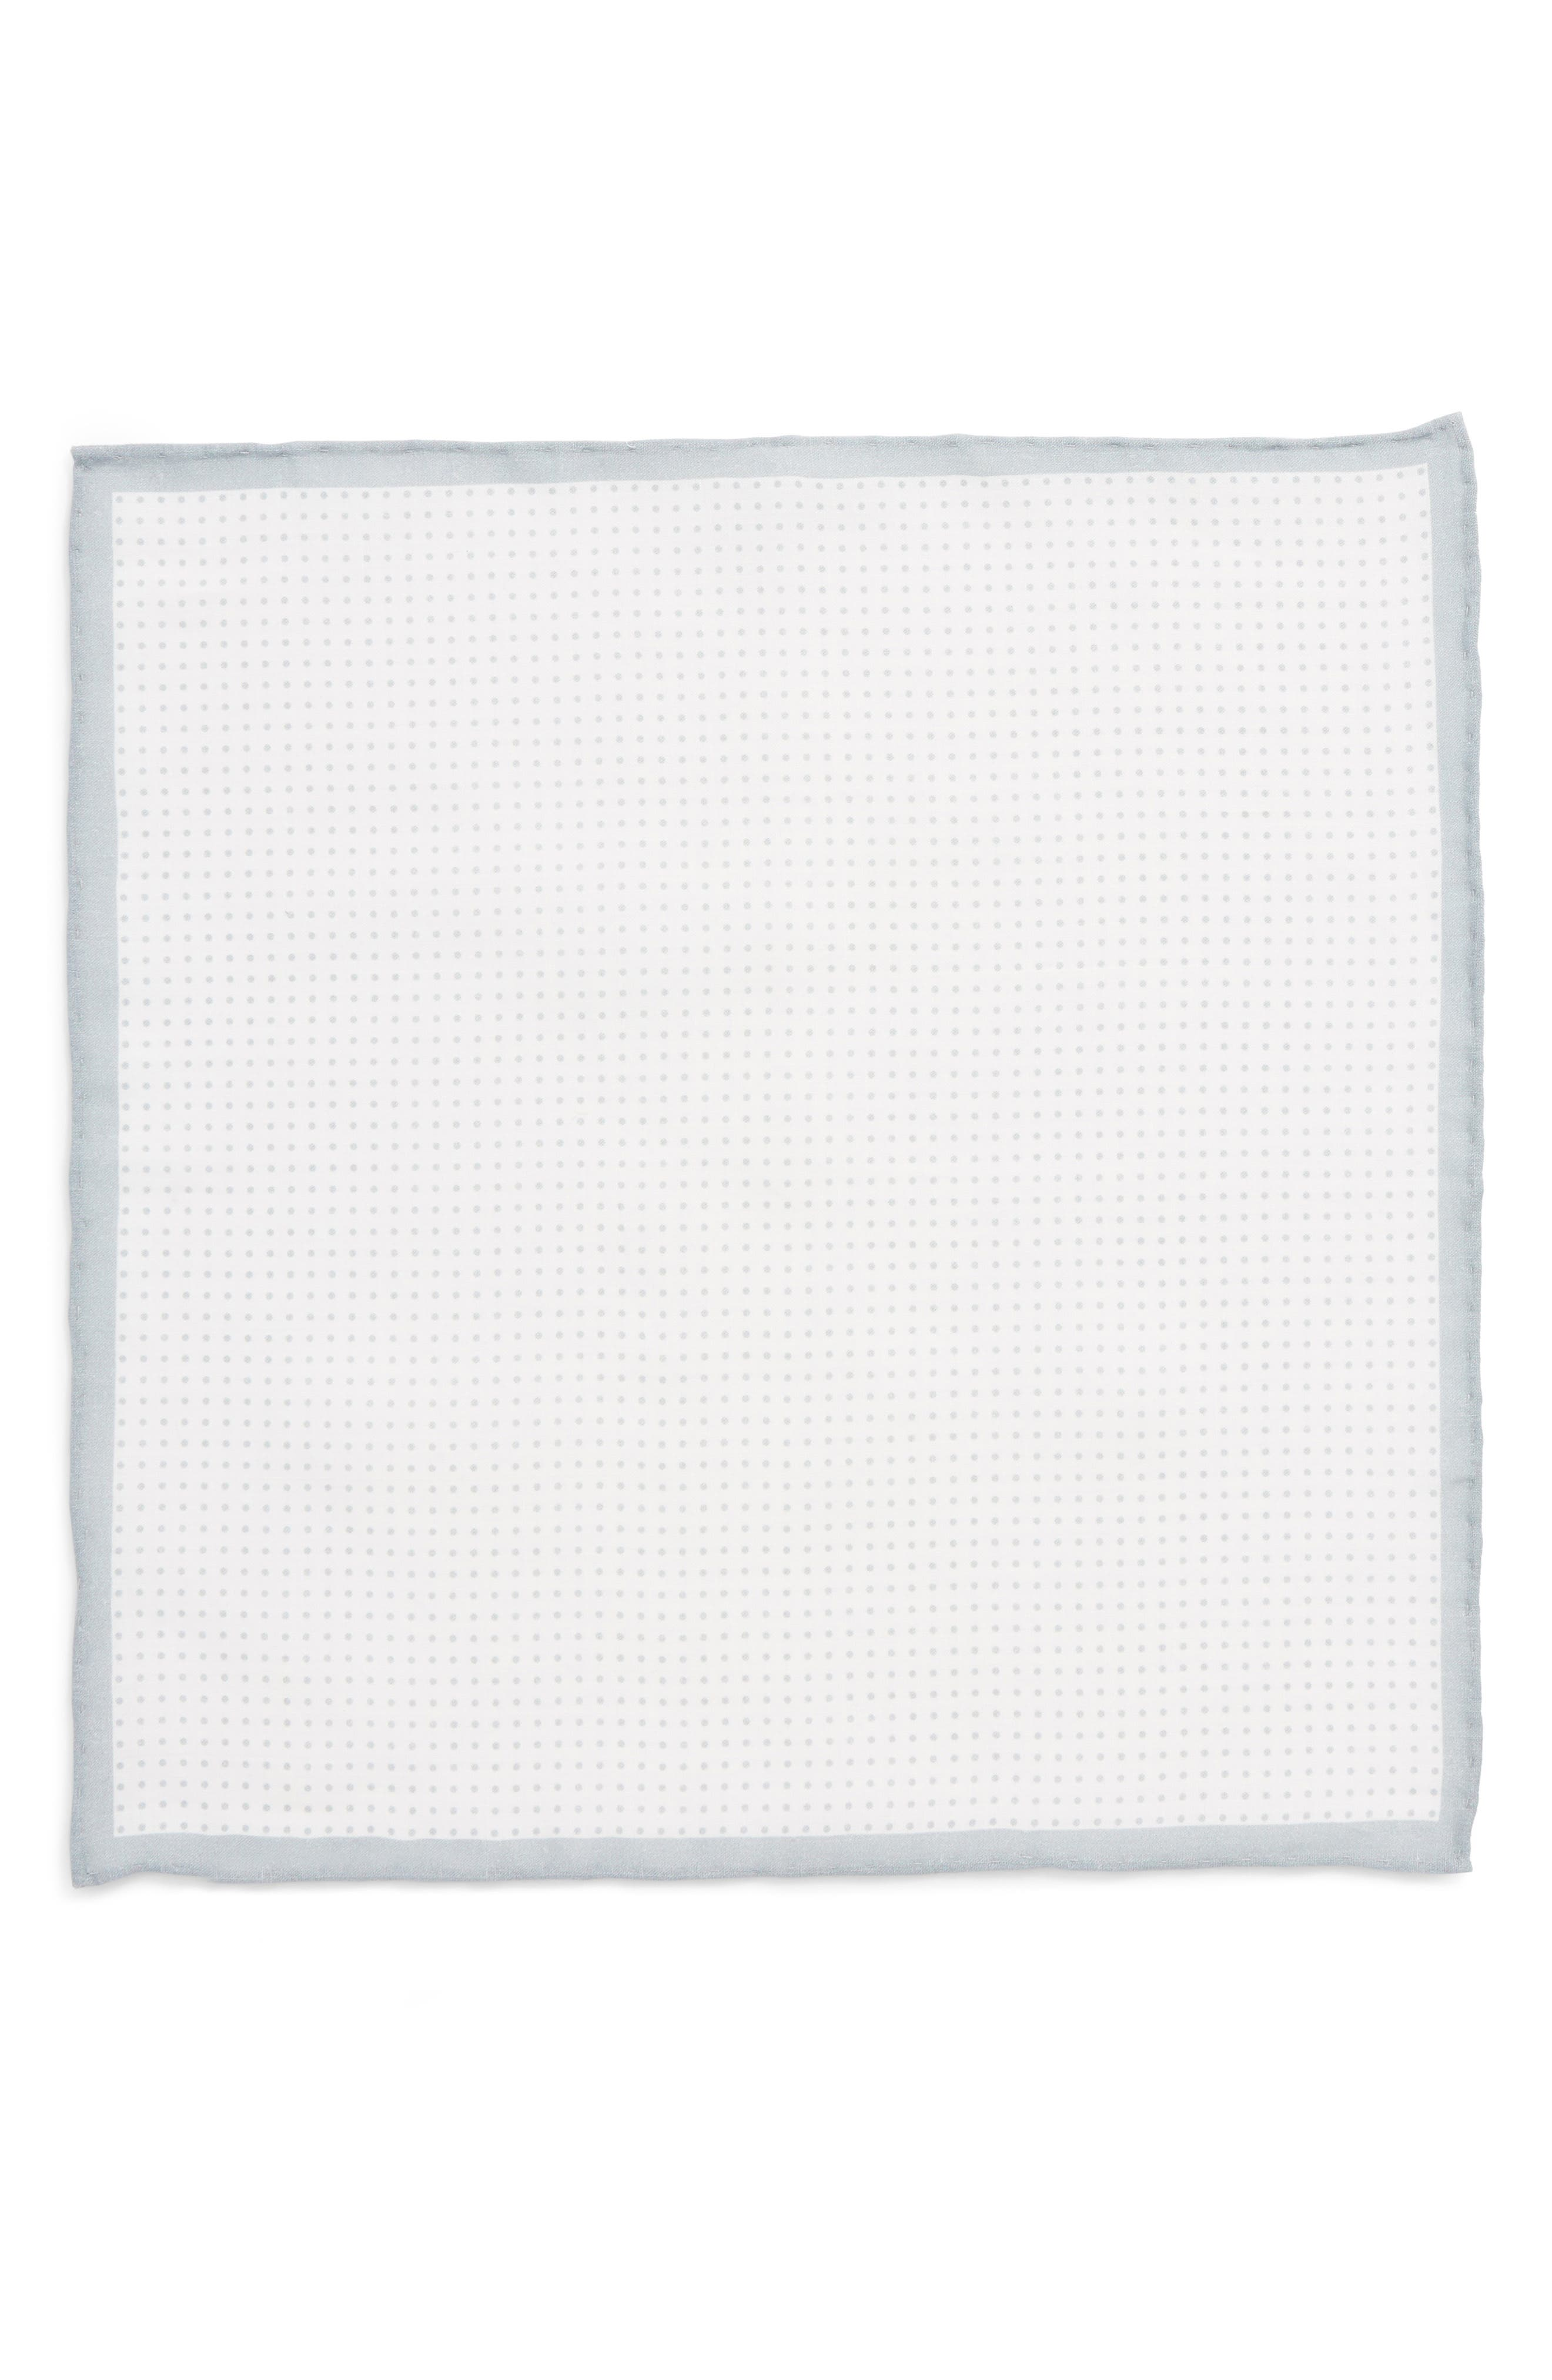 Alternate Image 2  - The Tie Bar Domino Dot Linen Pocket Square